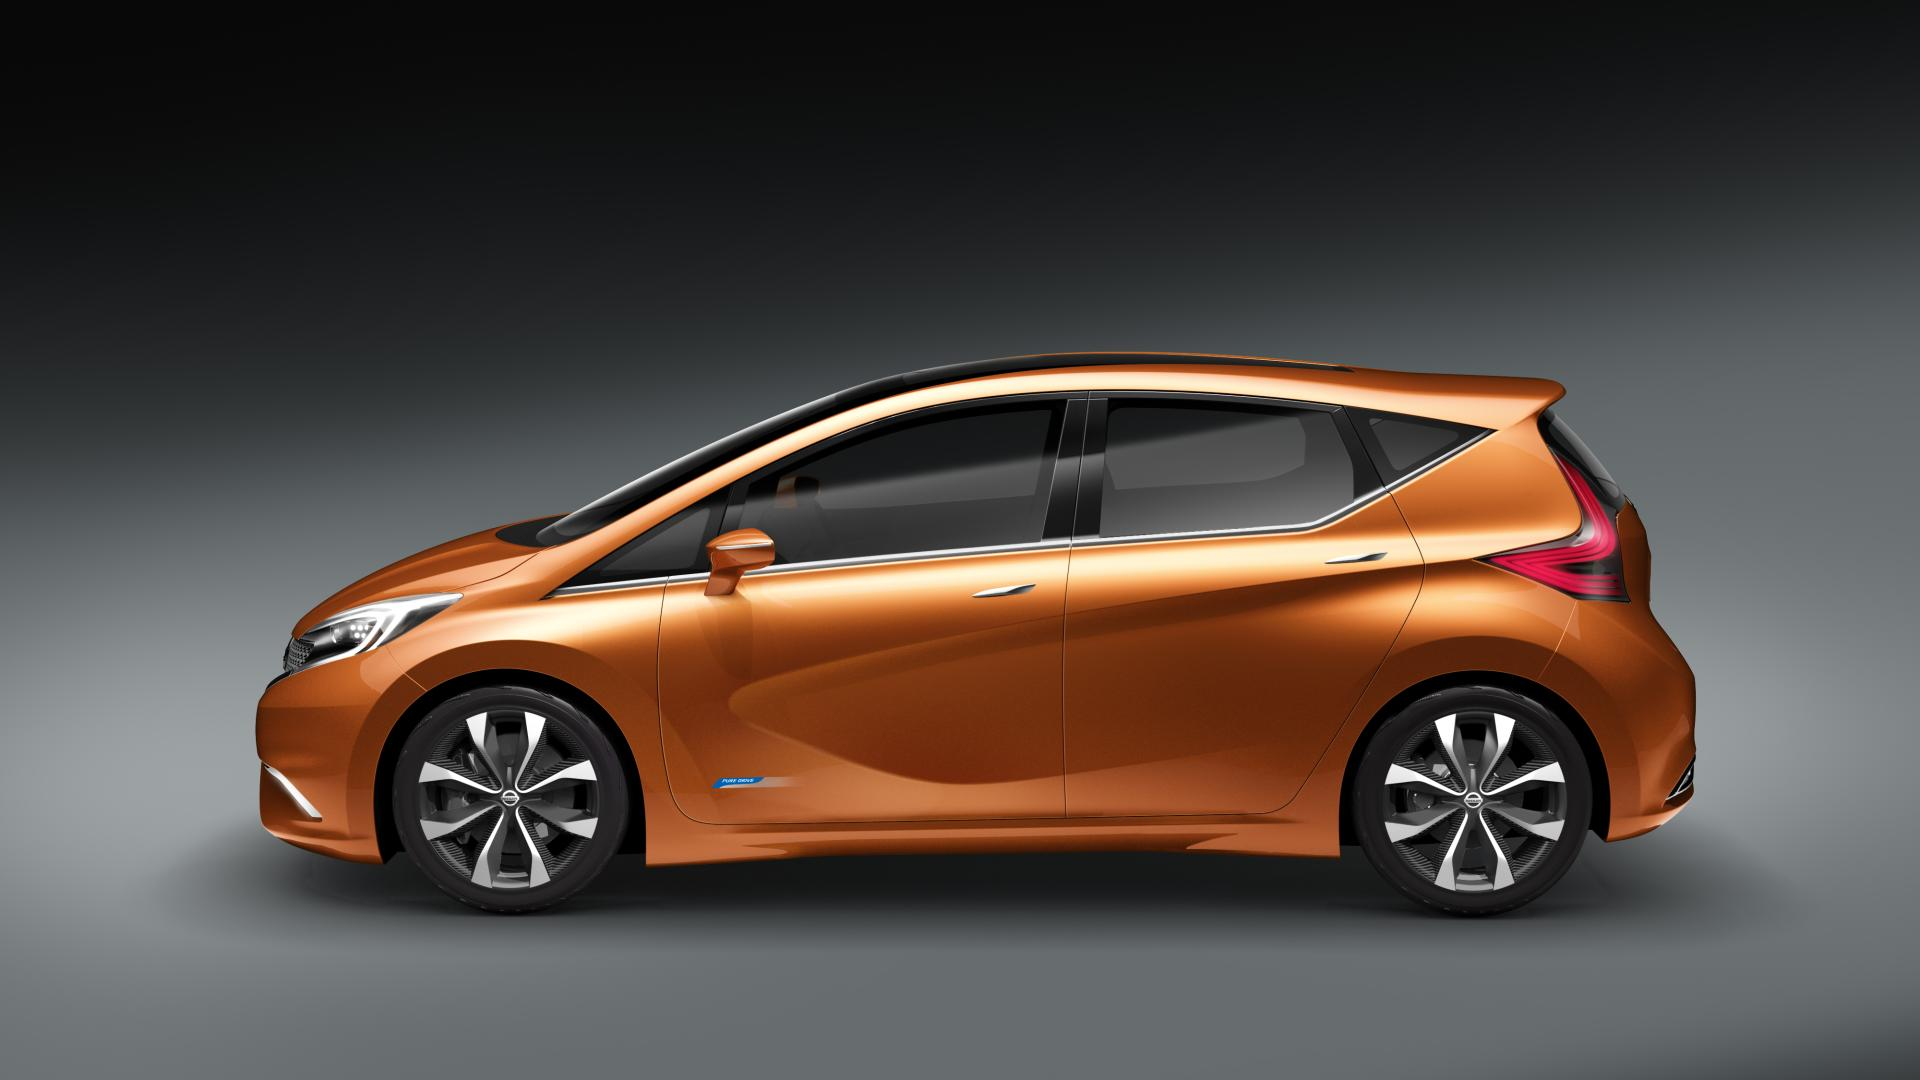 new car releases 2015 europe2012 Nissan INVITATION concept  conceptcarzcom